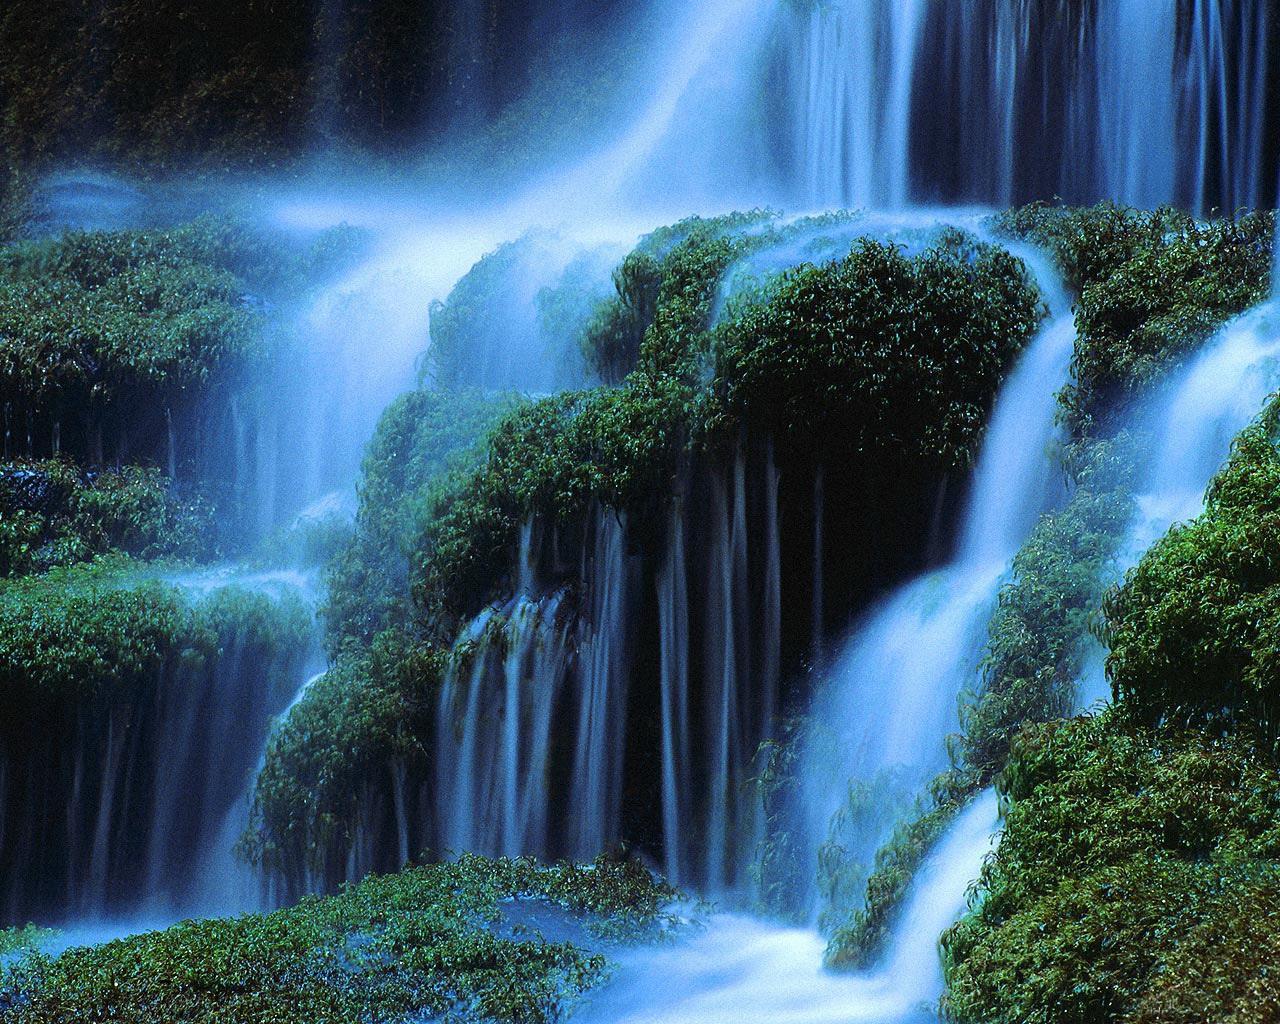 Water Fall Wallpaper Hd For Desktop Free Download Beautiful Wallpapers Waterfall Wallpapers